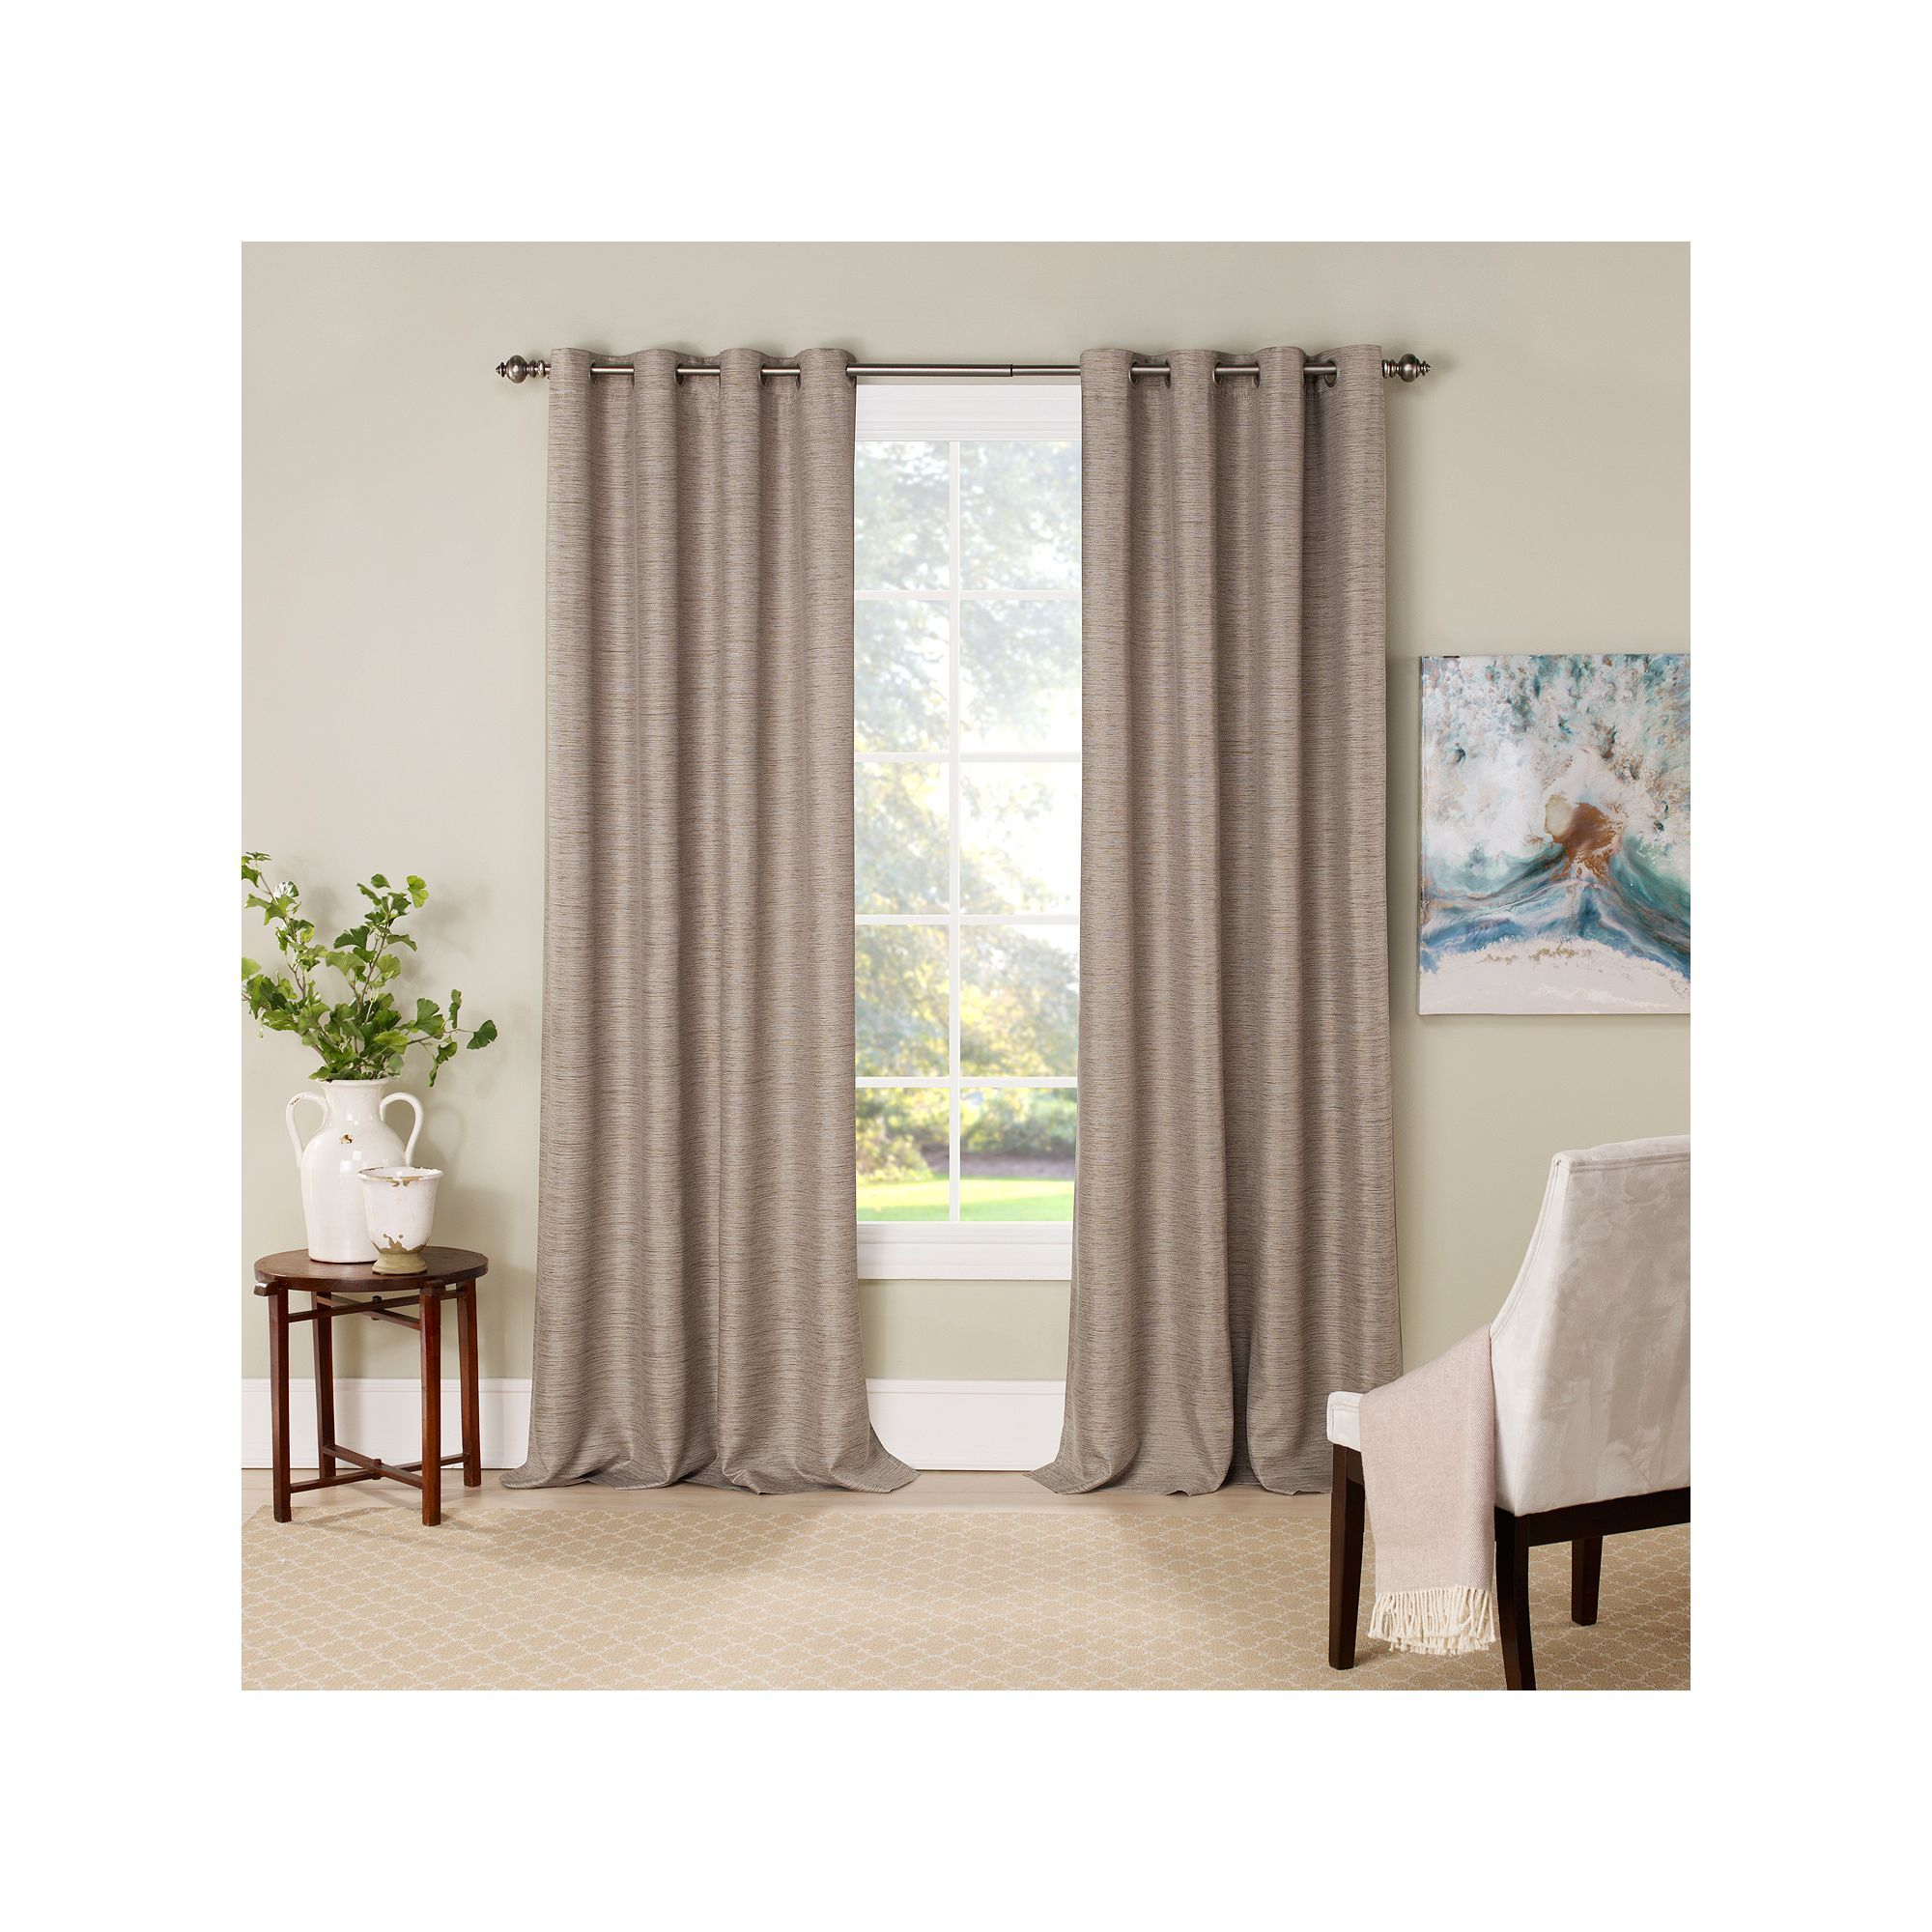 Eclipse Newport Blackout Window Curtain, Dark Beige, 52x63 Regarding Eclipse Newport Blackout Curtain Panels (View 5 of 20)